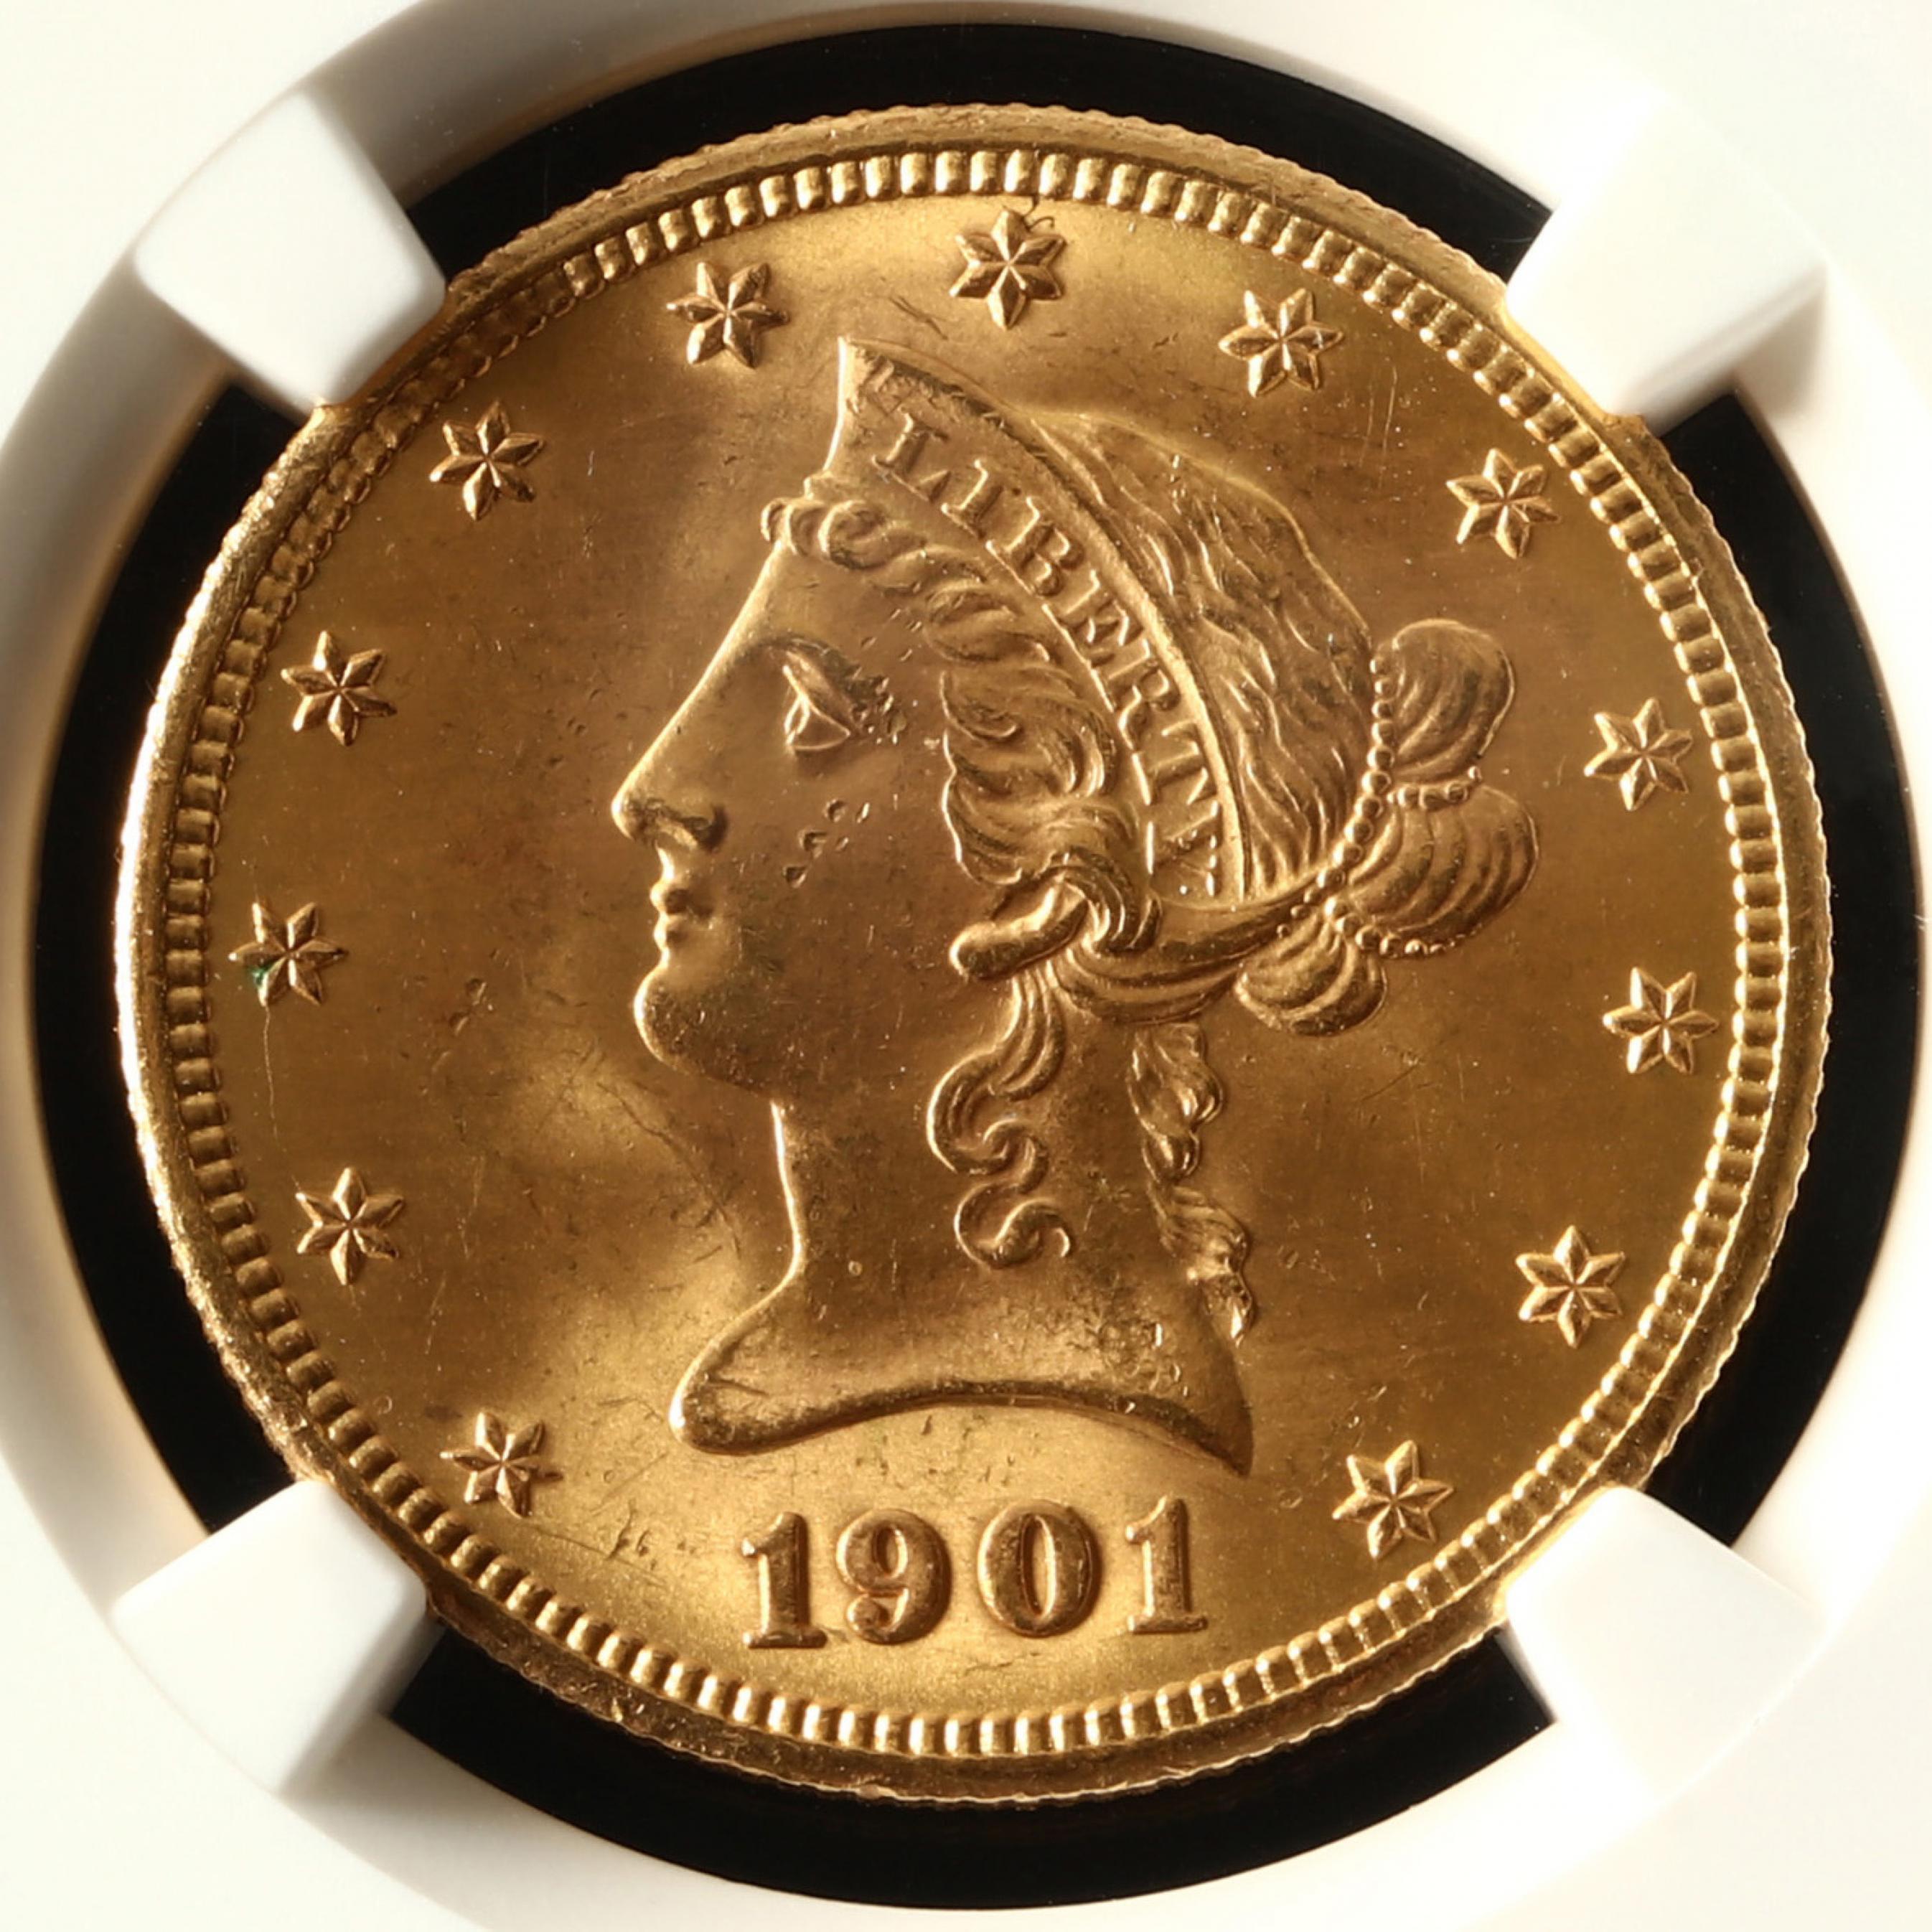 1901-s-10-liberty-head-gold-eagle-ngc-ms64